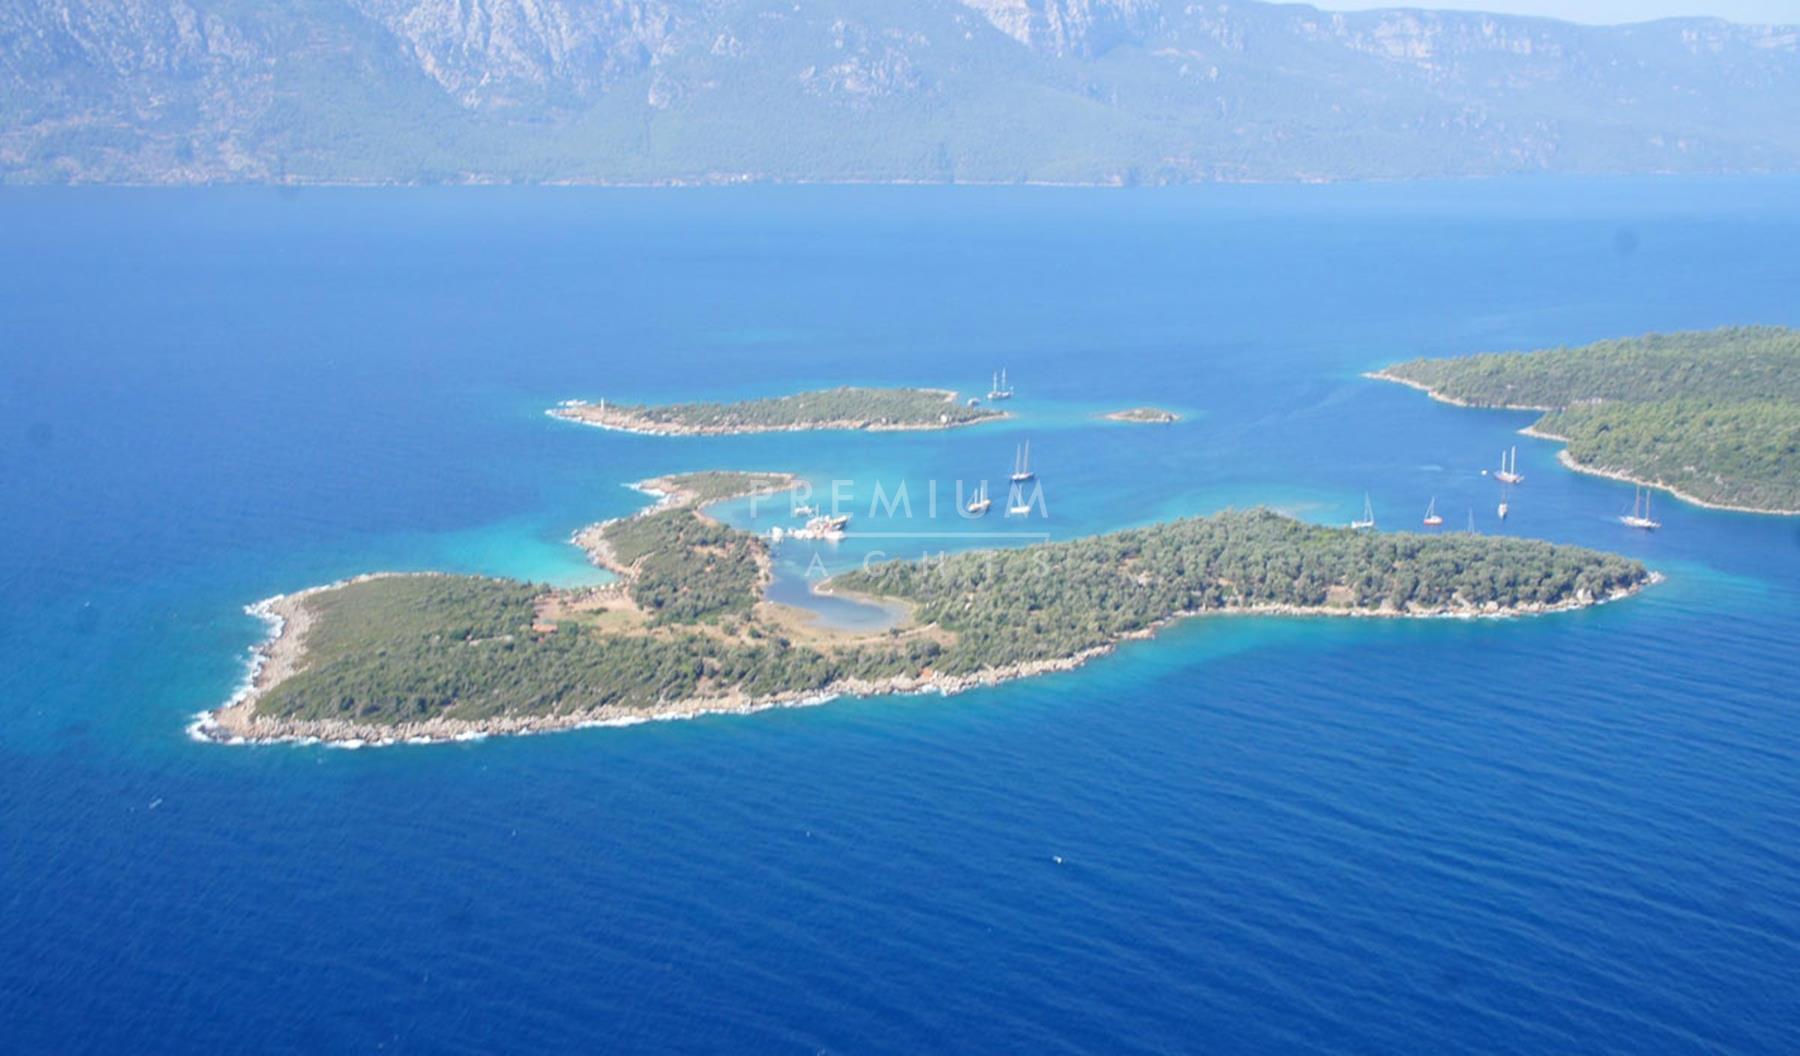 Sedir island, Cleopatra